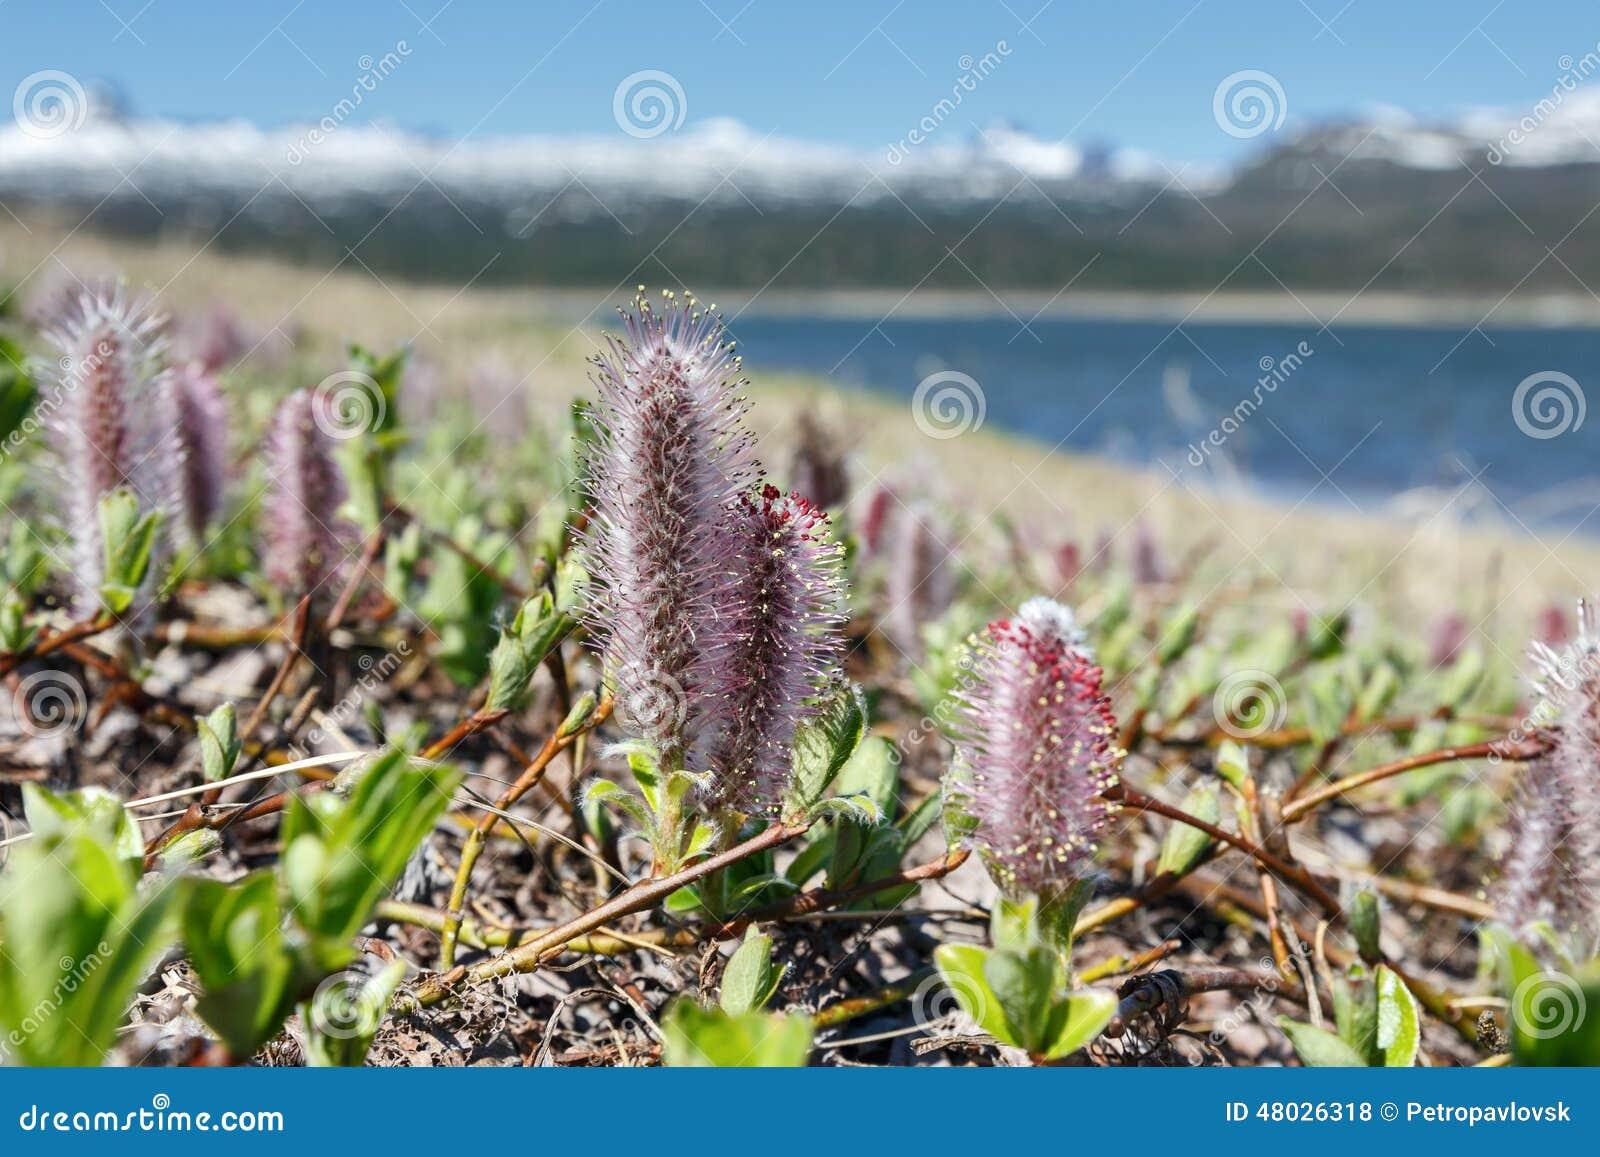 Salix arctica (arctic willow)